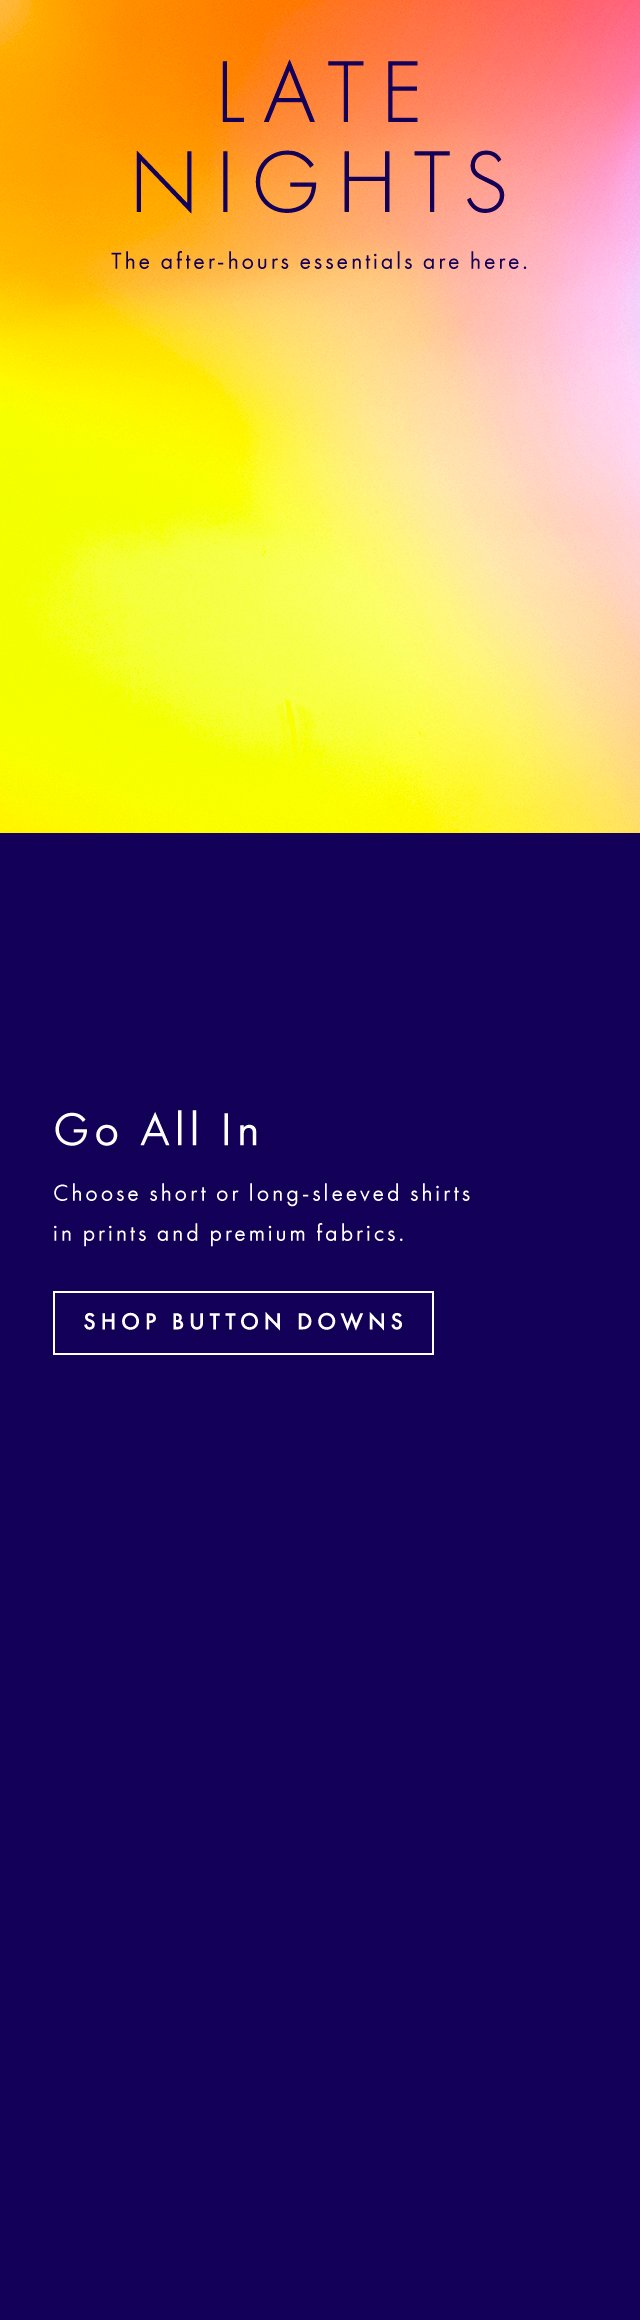 Shop Jackets & outerwear